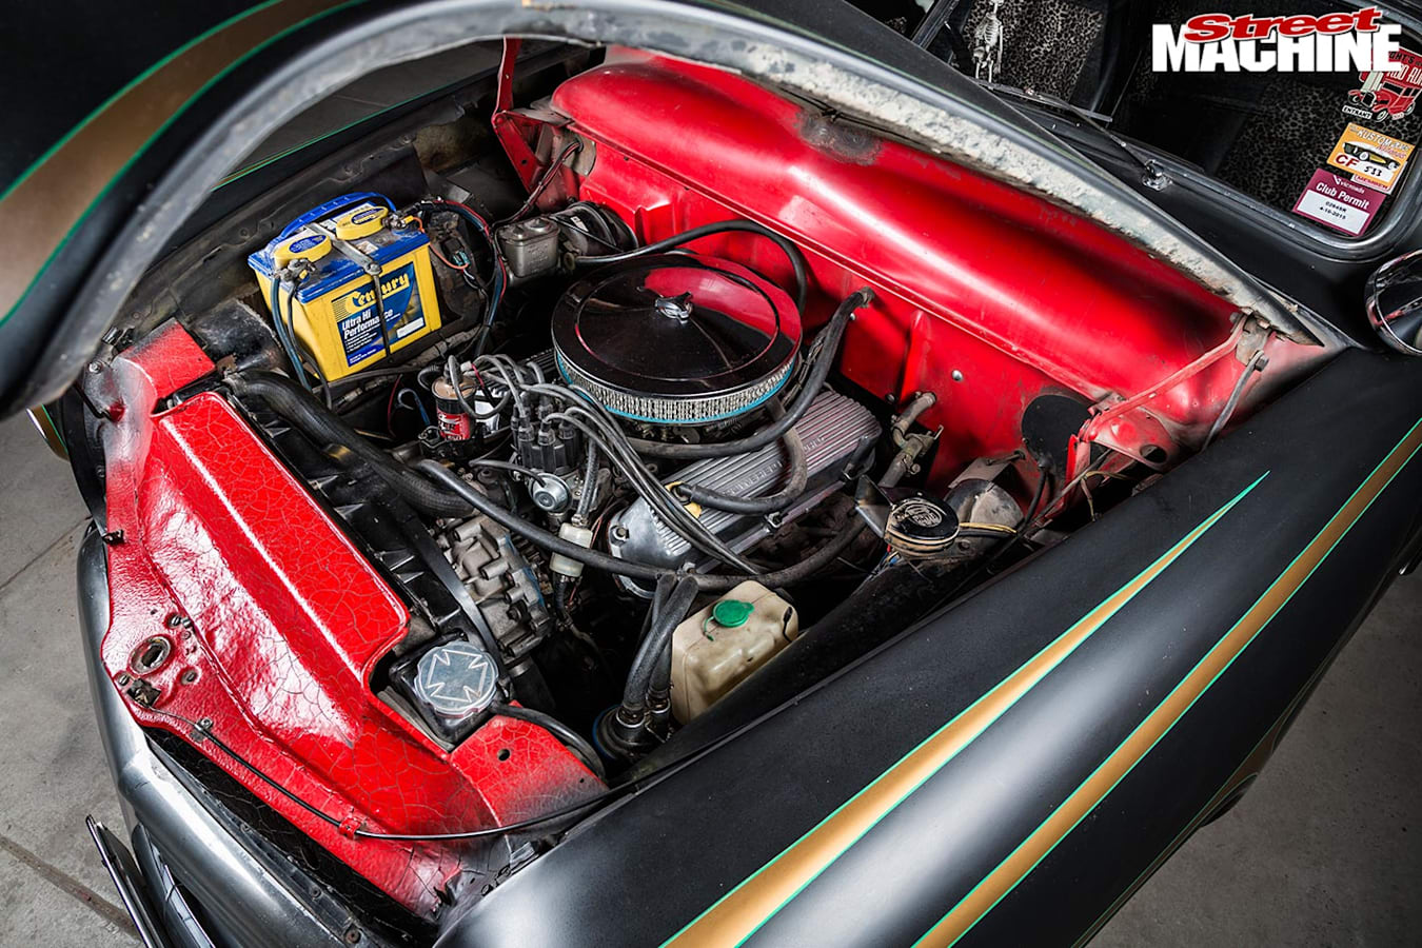 Ford Spinner engine